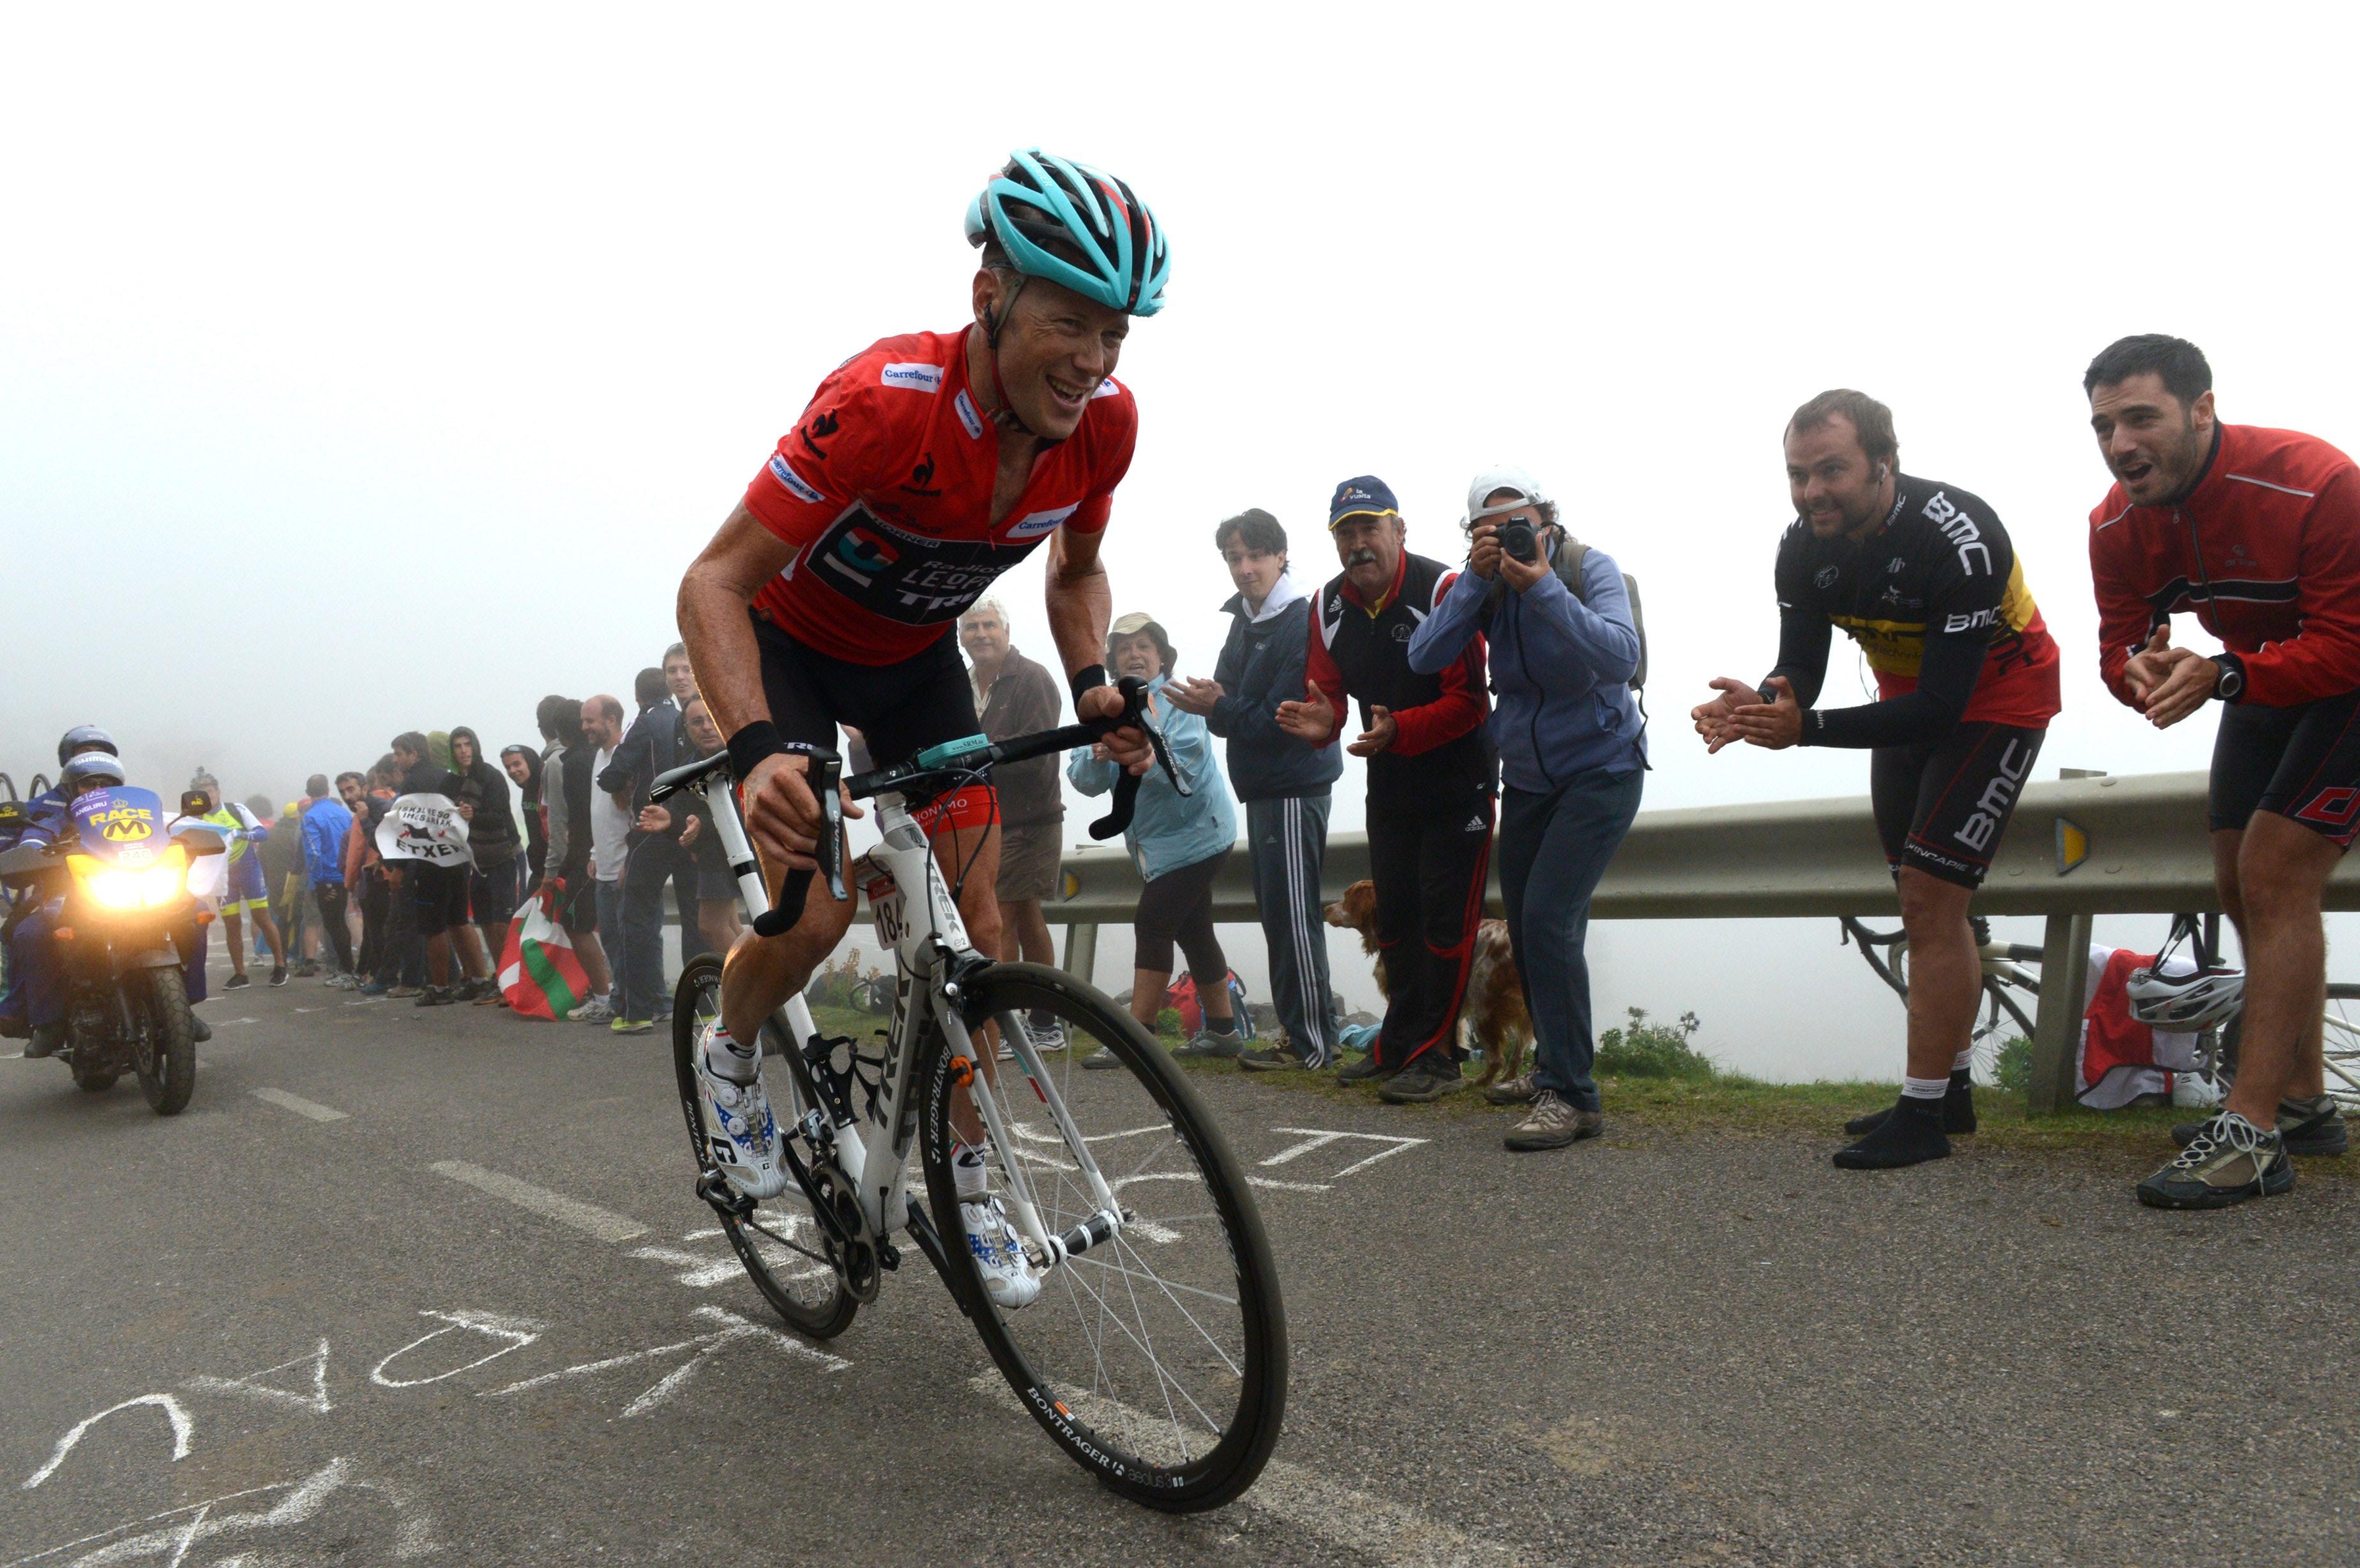 Christopher Horner, Radioshack Leopard, red jersey, Algiru, Vuelta a Espana, 2013, pic: Sirotti